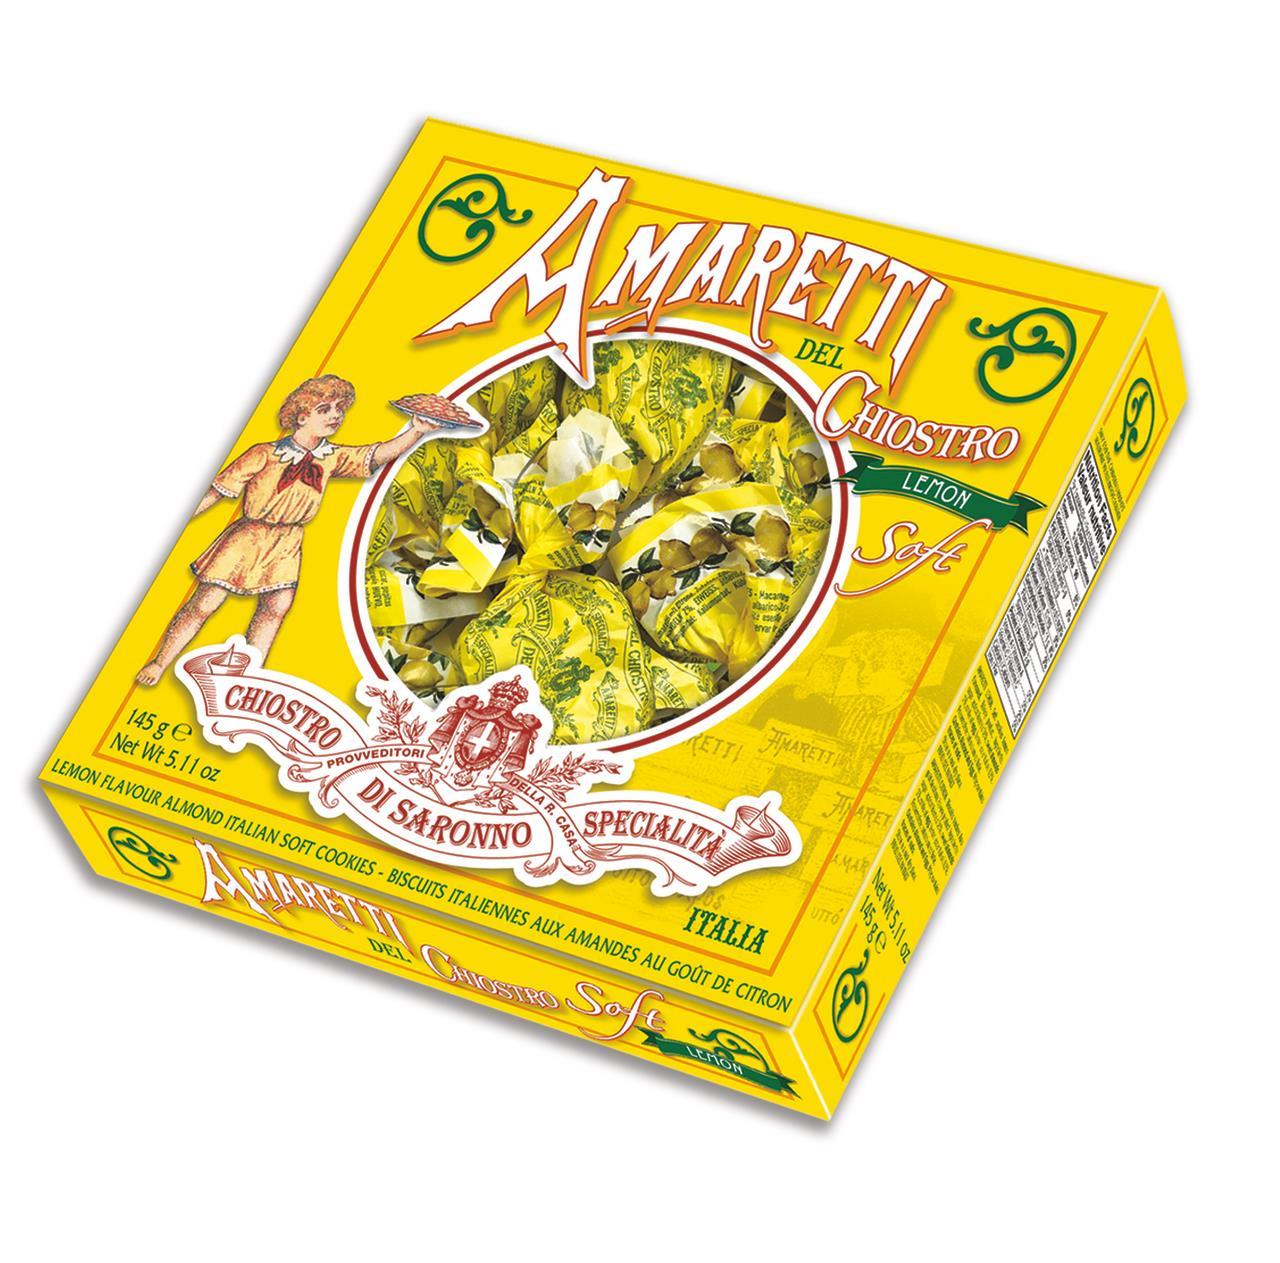 Печенье CHIOSTRO DI SARONNO лимон амарэт, 145 г